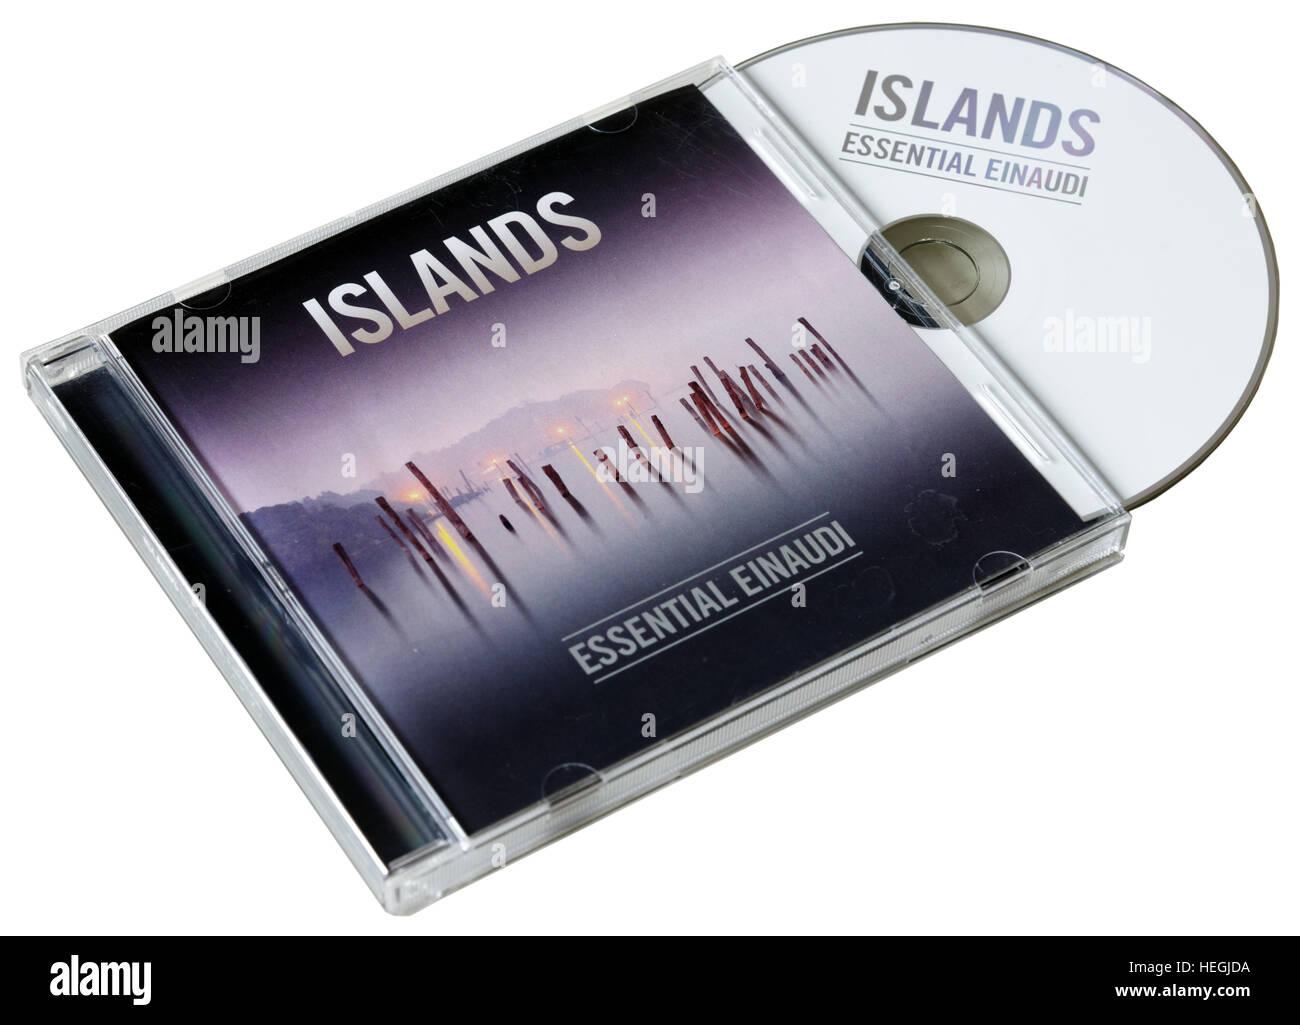 Islands - Essential Einaudi CD by Ludovico Einaudi - Stock Image